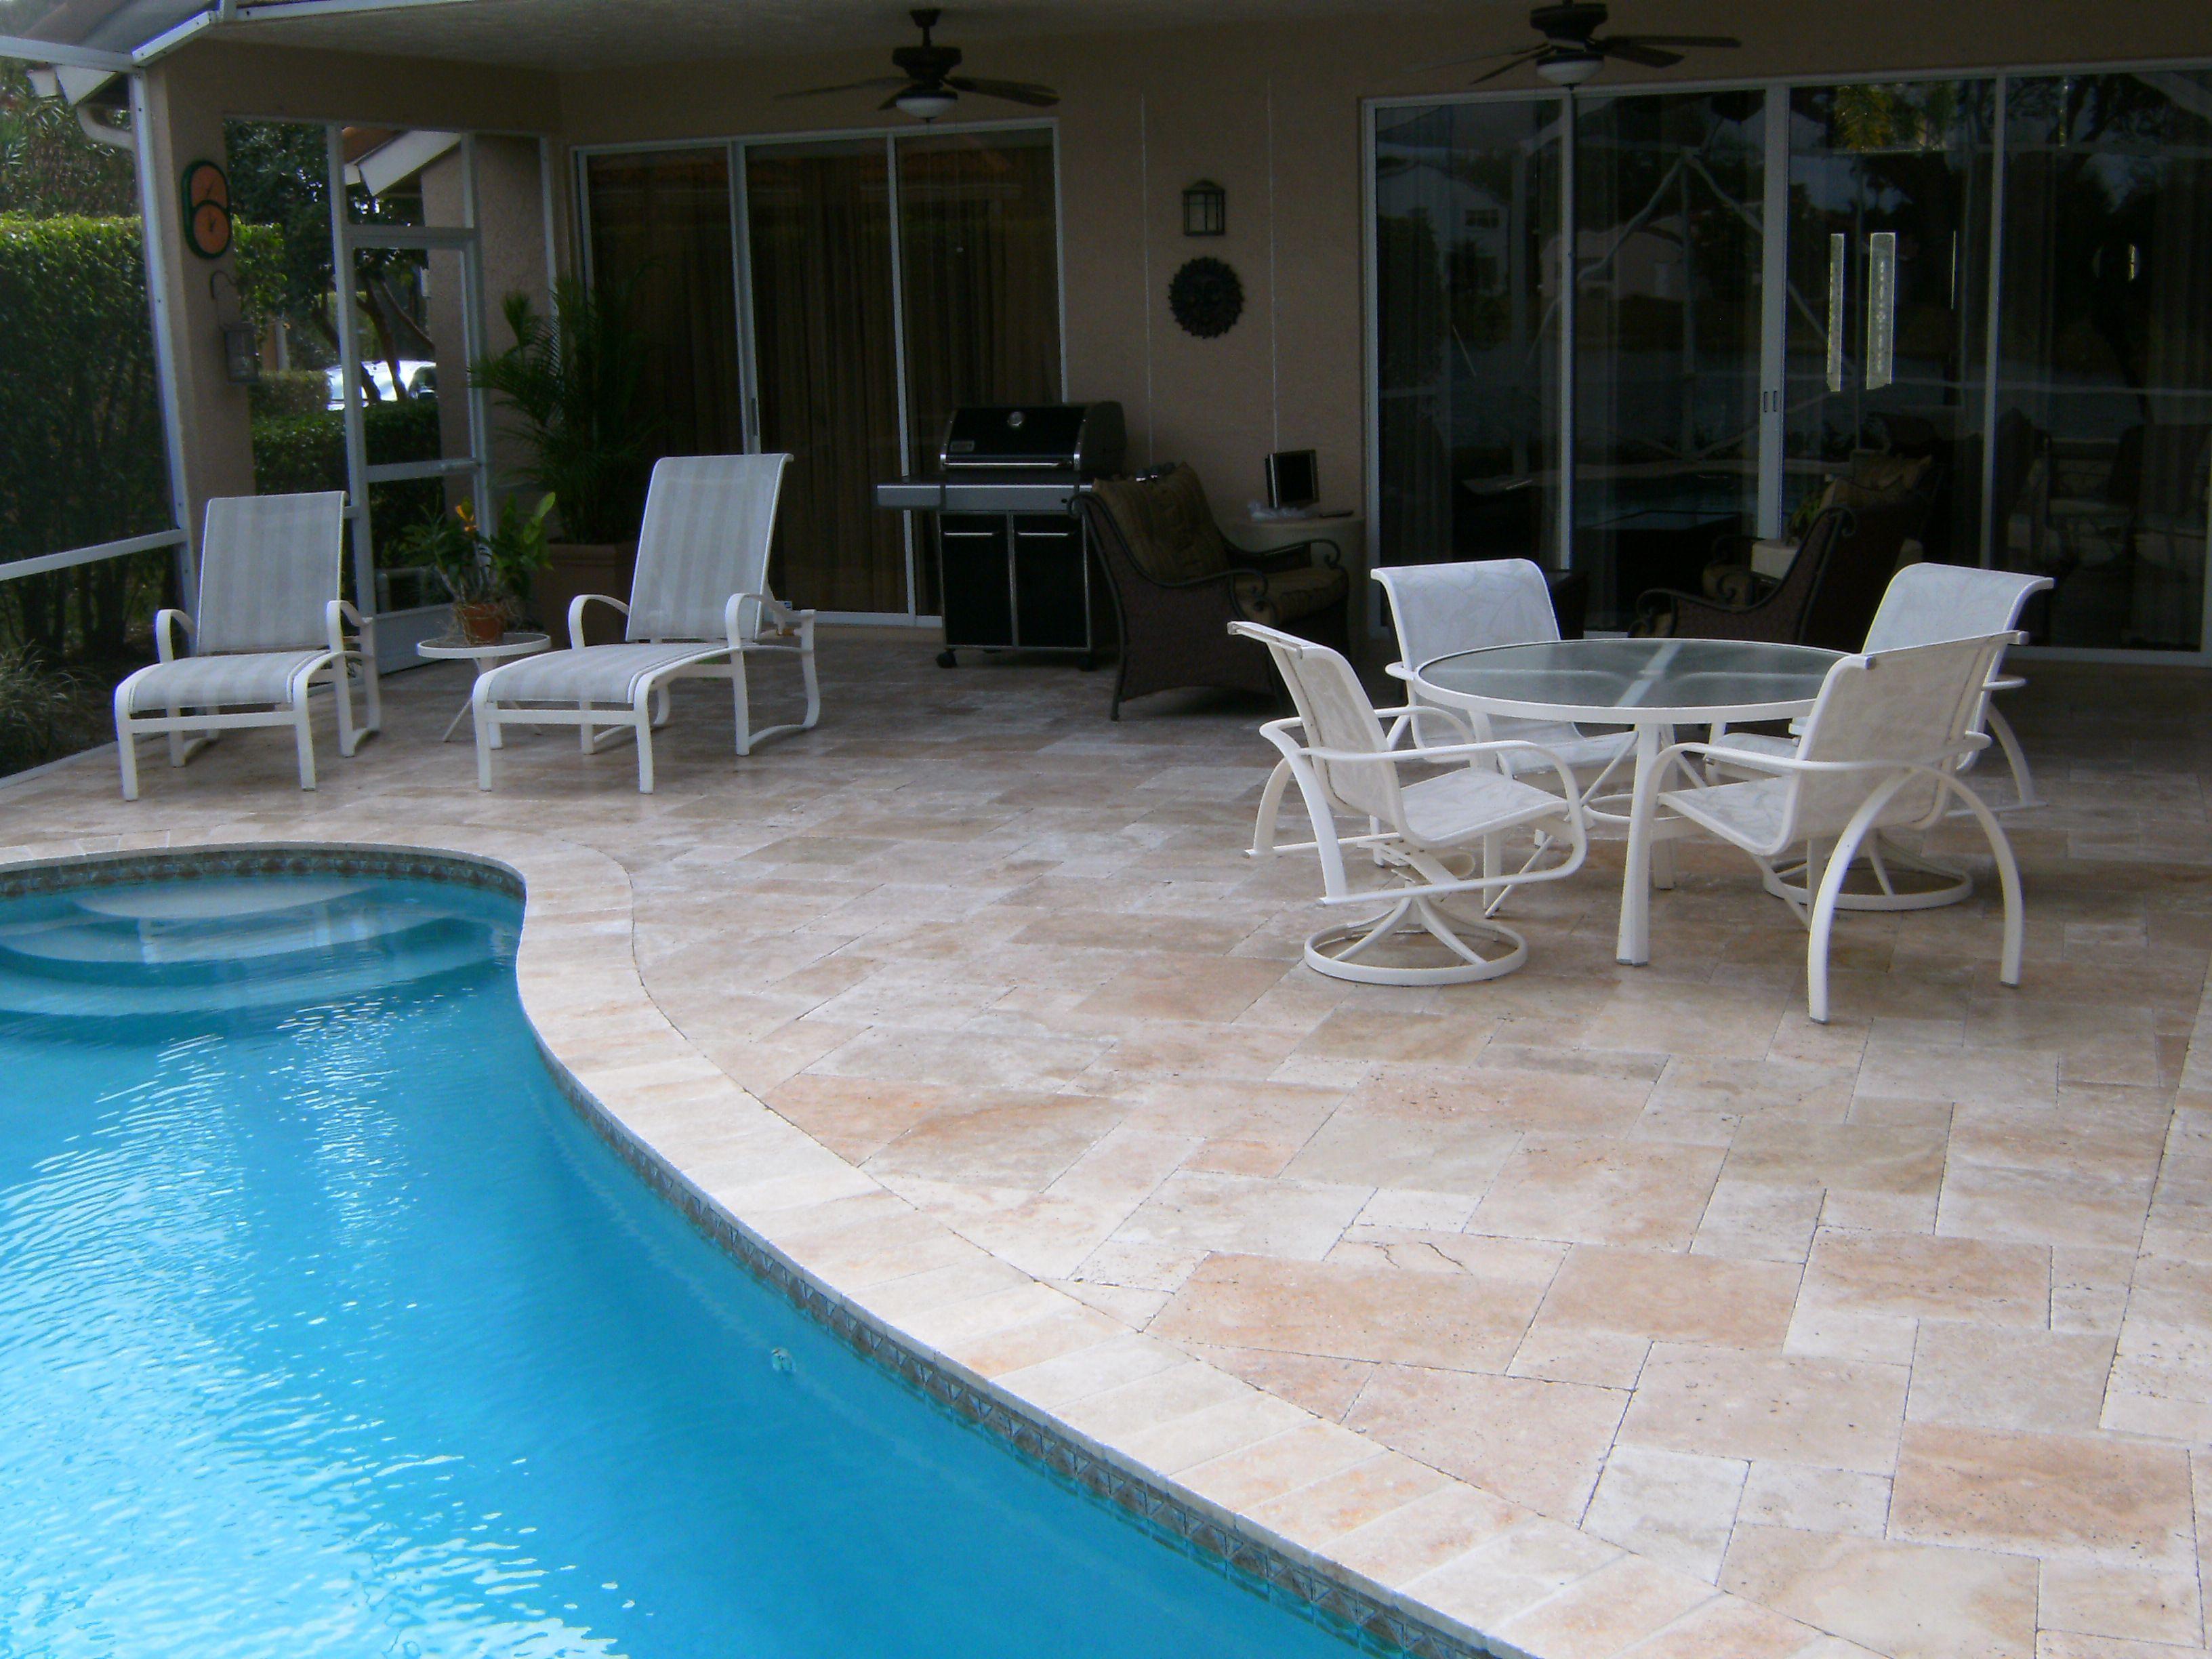 Noce Travertine Pool Decking Pool Decks Patio Tiles